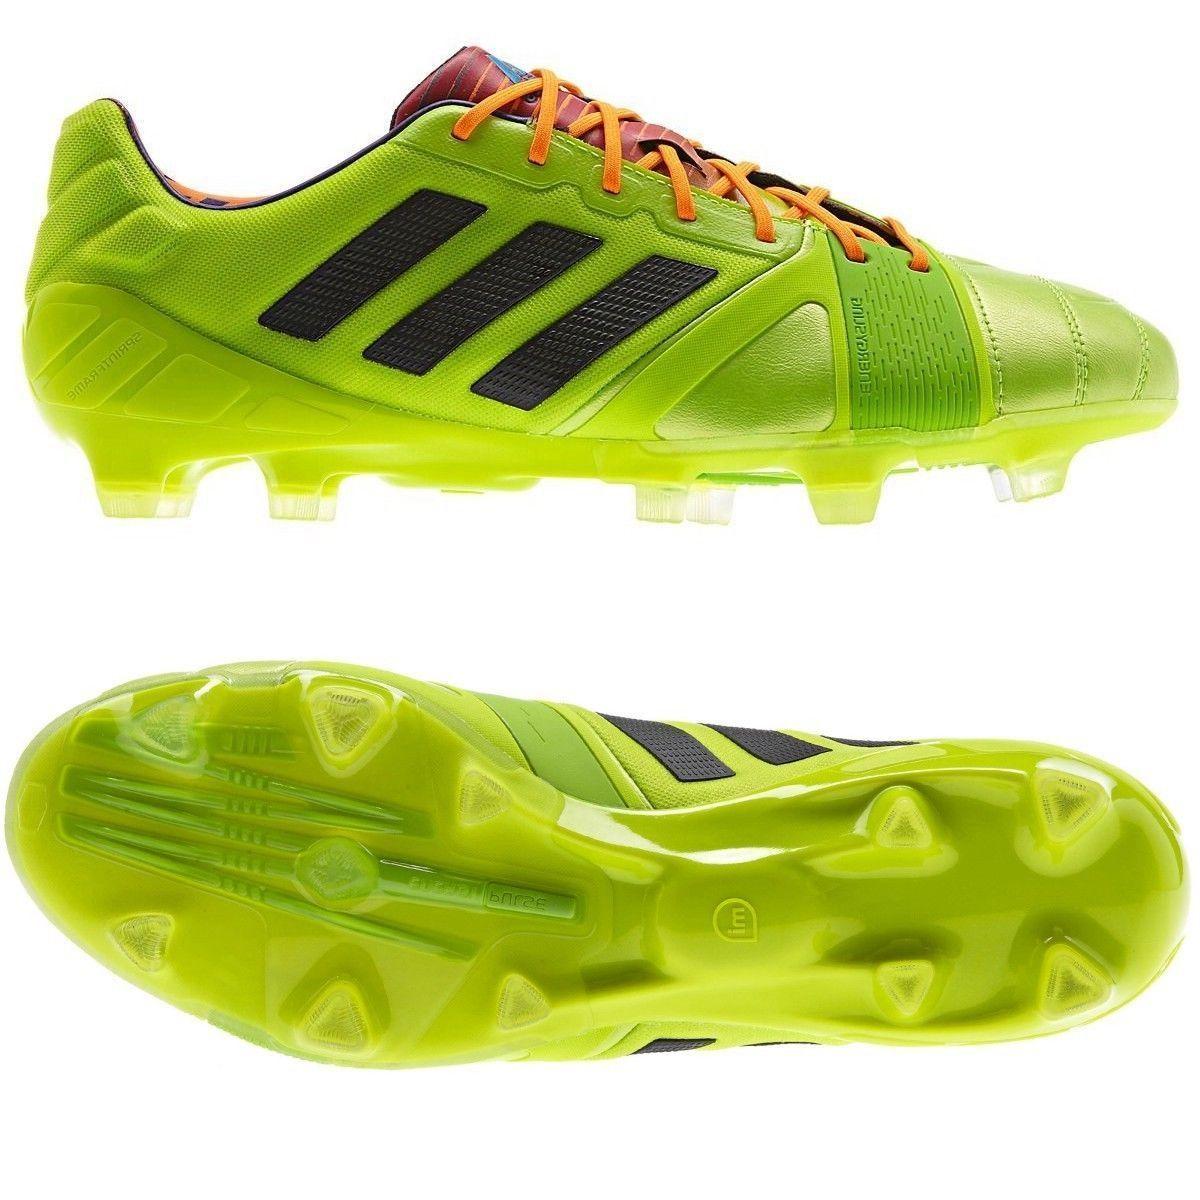 Adidas Nitrocharge 1.0 Trx Fg verde Lima Rendimiento de Fútbol botas para hombre